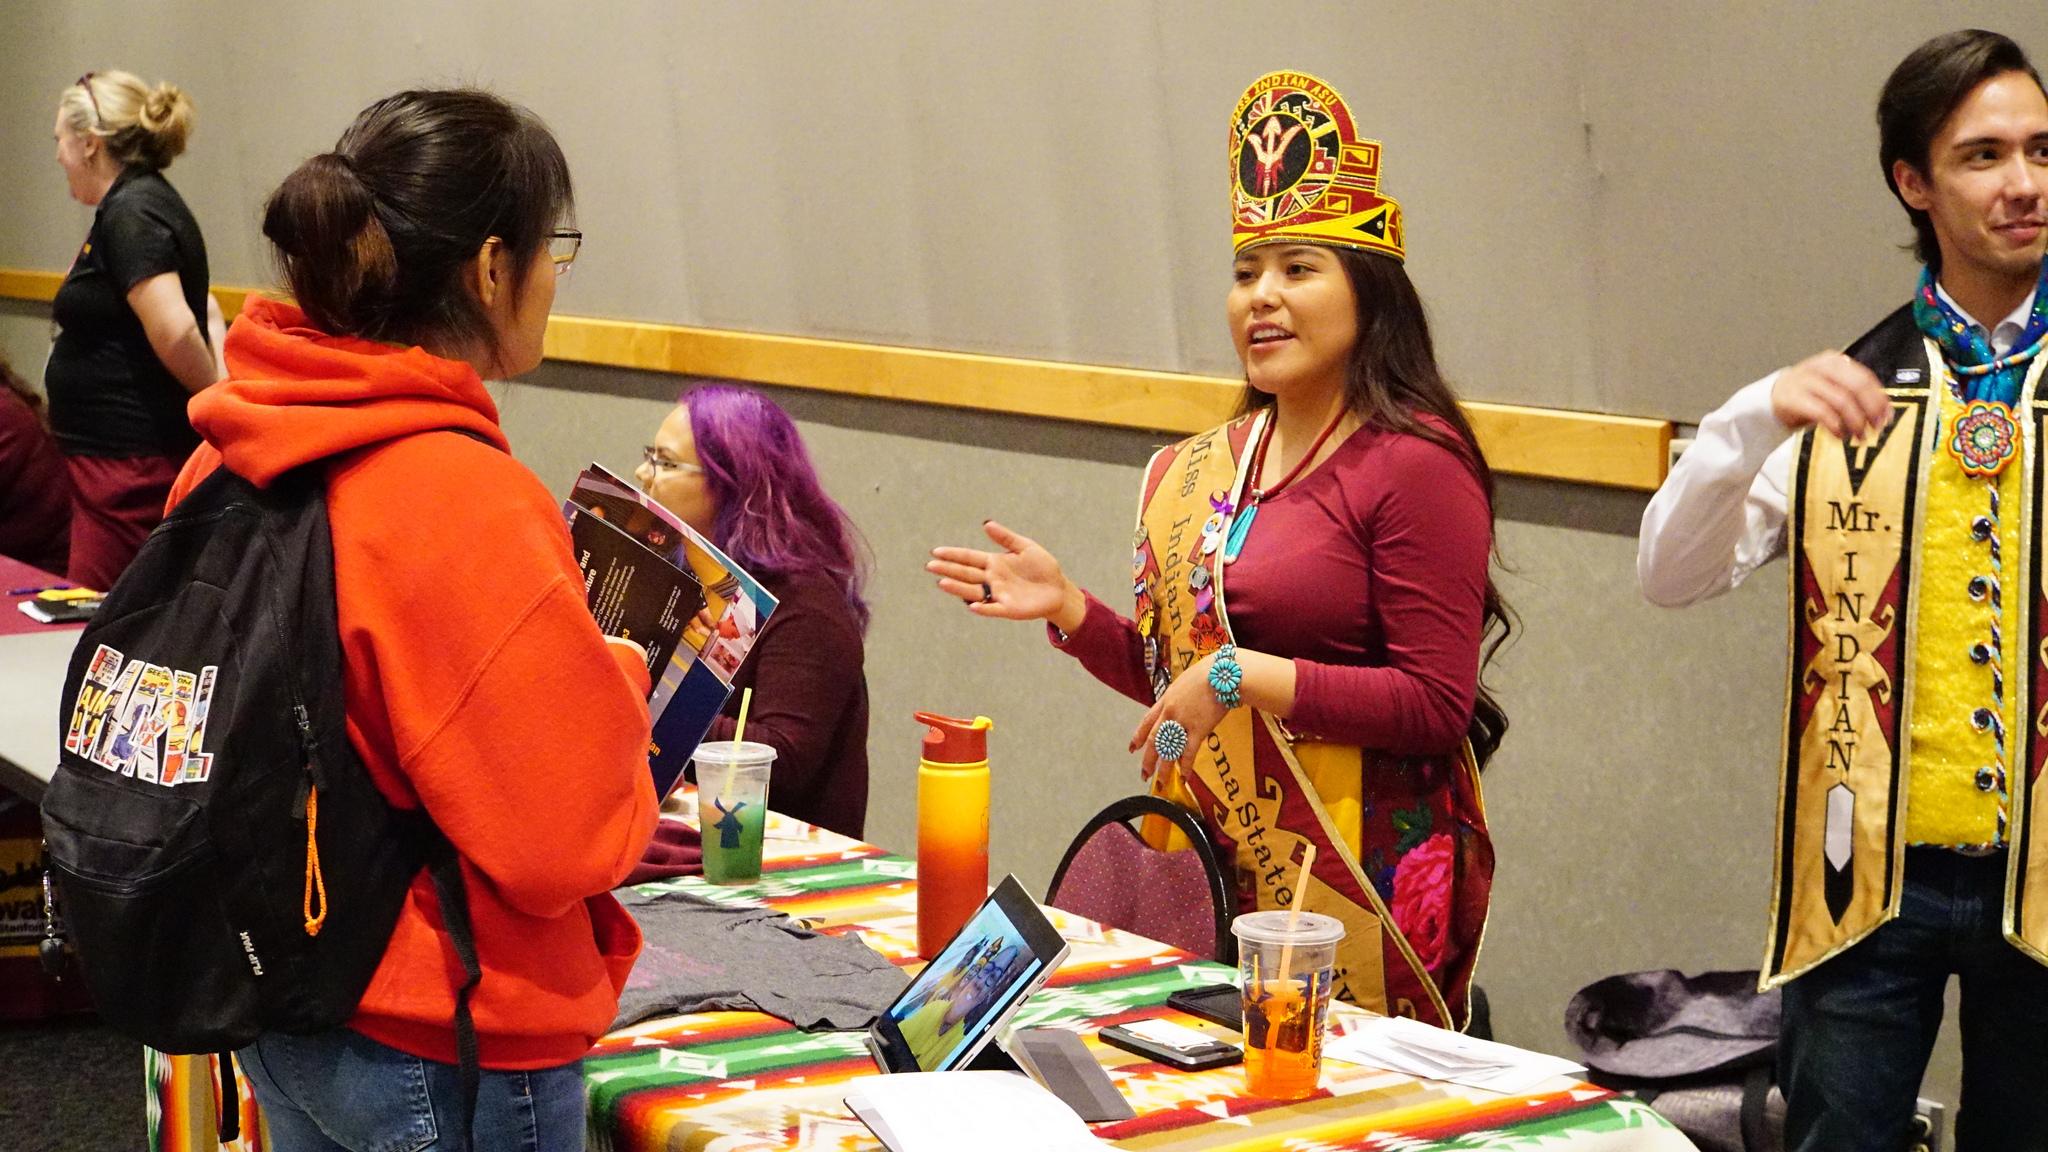 ASU representatives speak with students